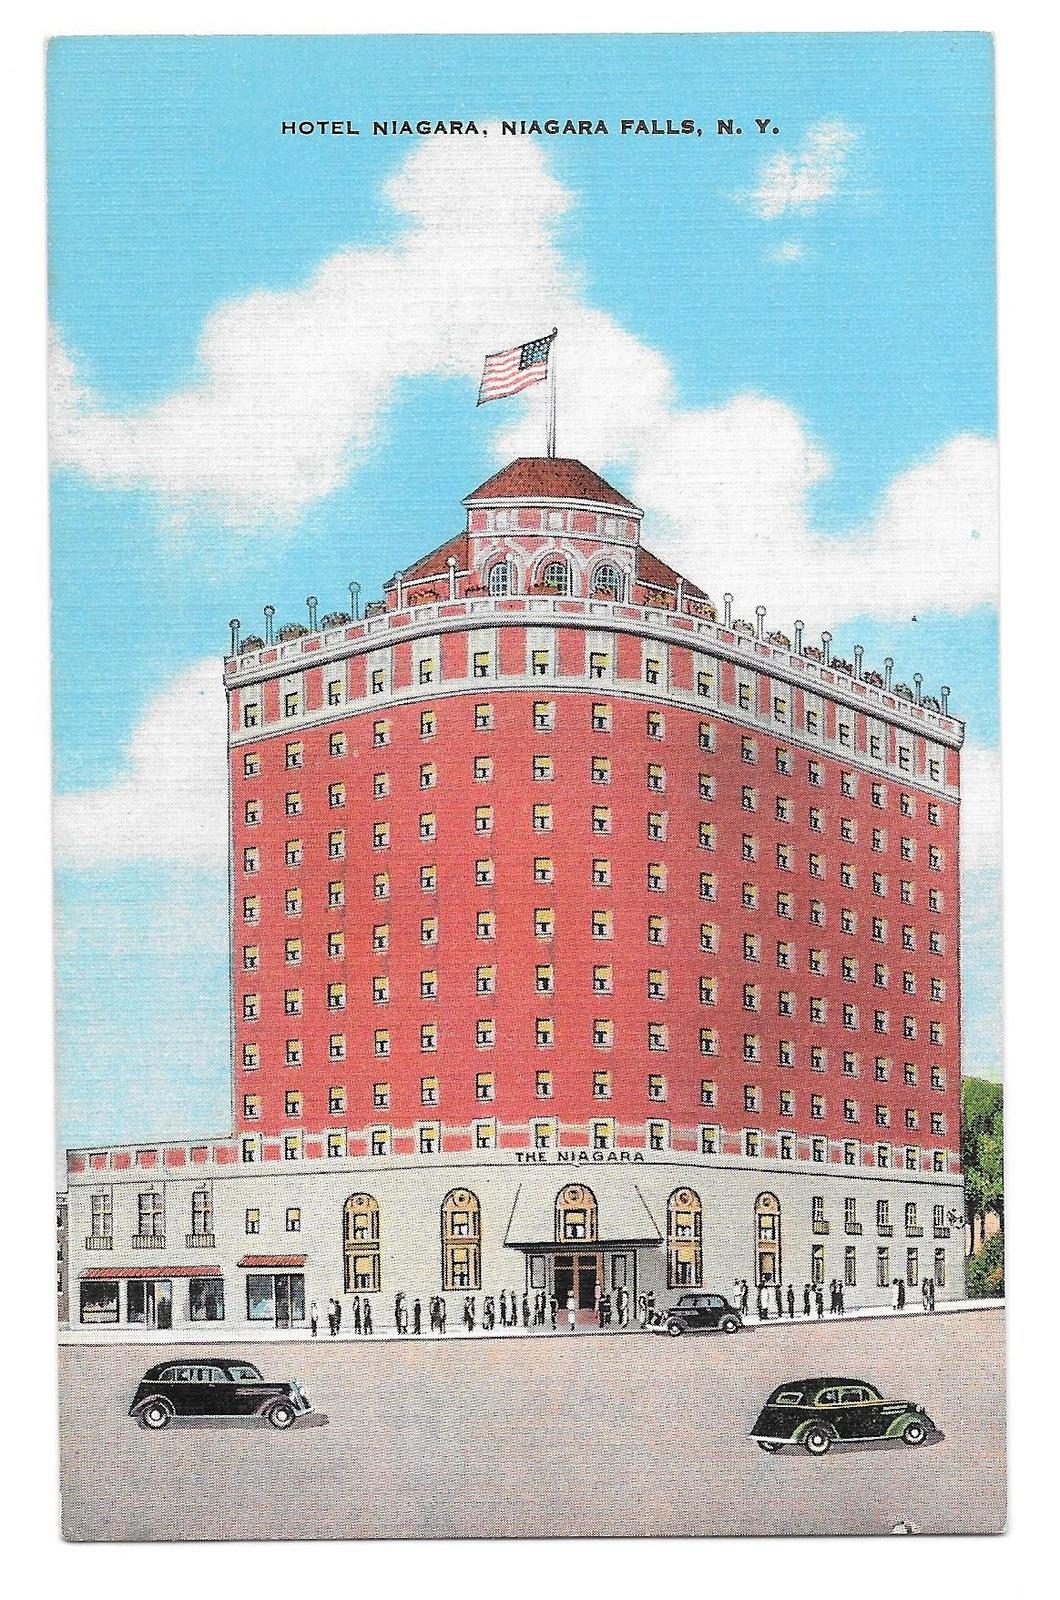 99 br 1925 1bx ny niagara falls hotel niagara kropp linen